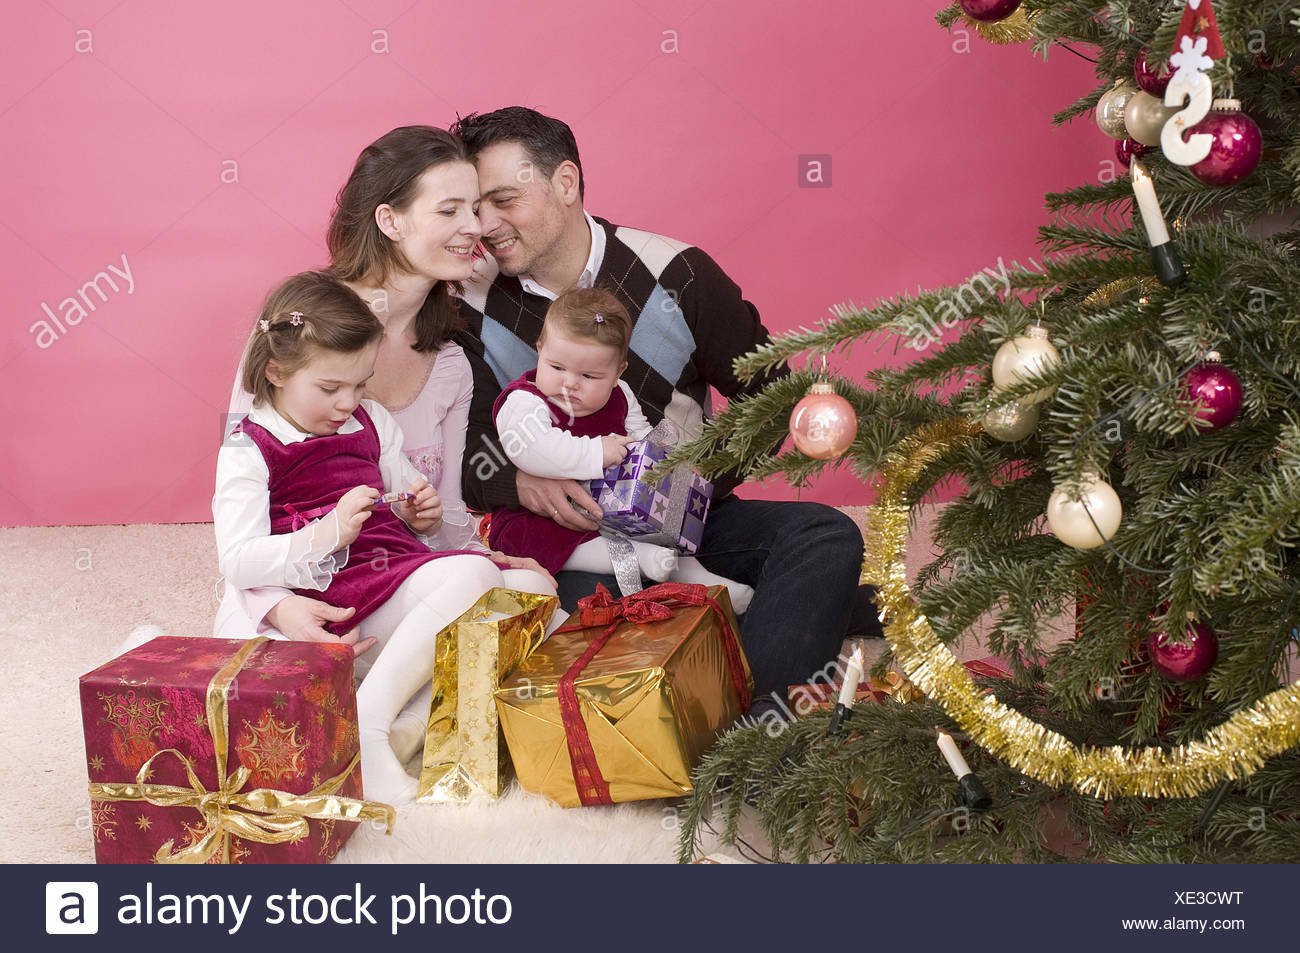 Family, happily, Christmas tree, presents, - Stock Image